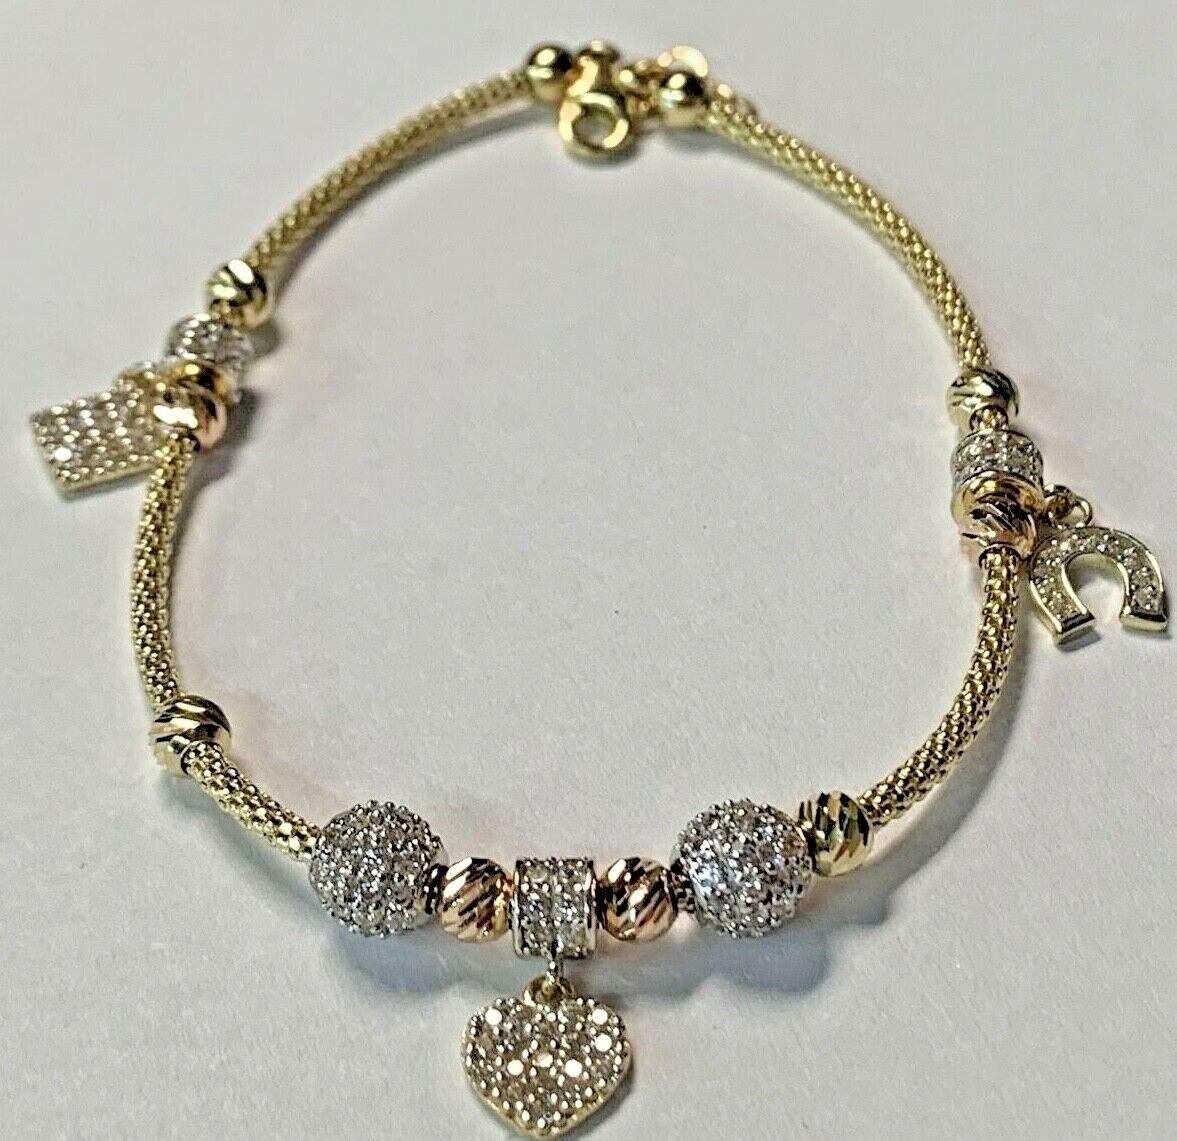 14k Yellow Gold & Cubic Zirconia  Women's Heart Charm Bracelet  7.5 - 8 inch